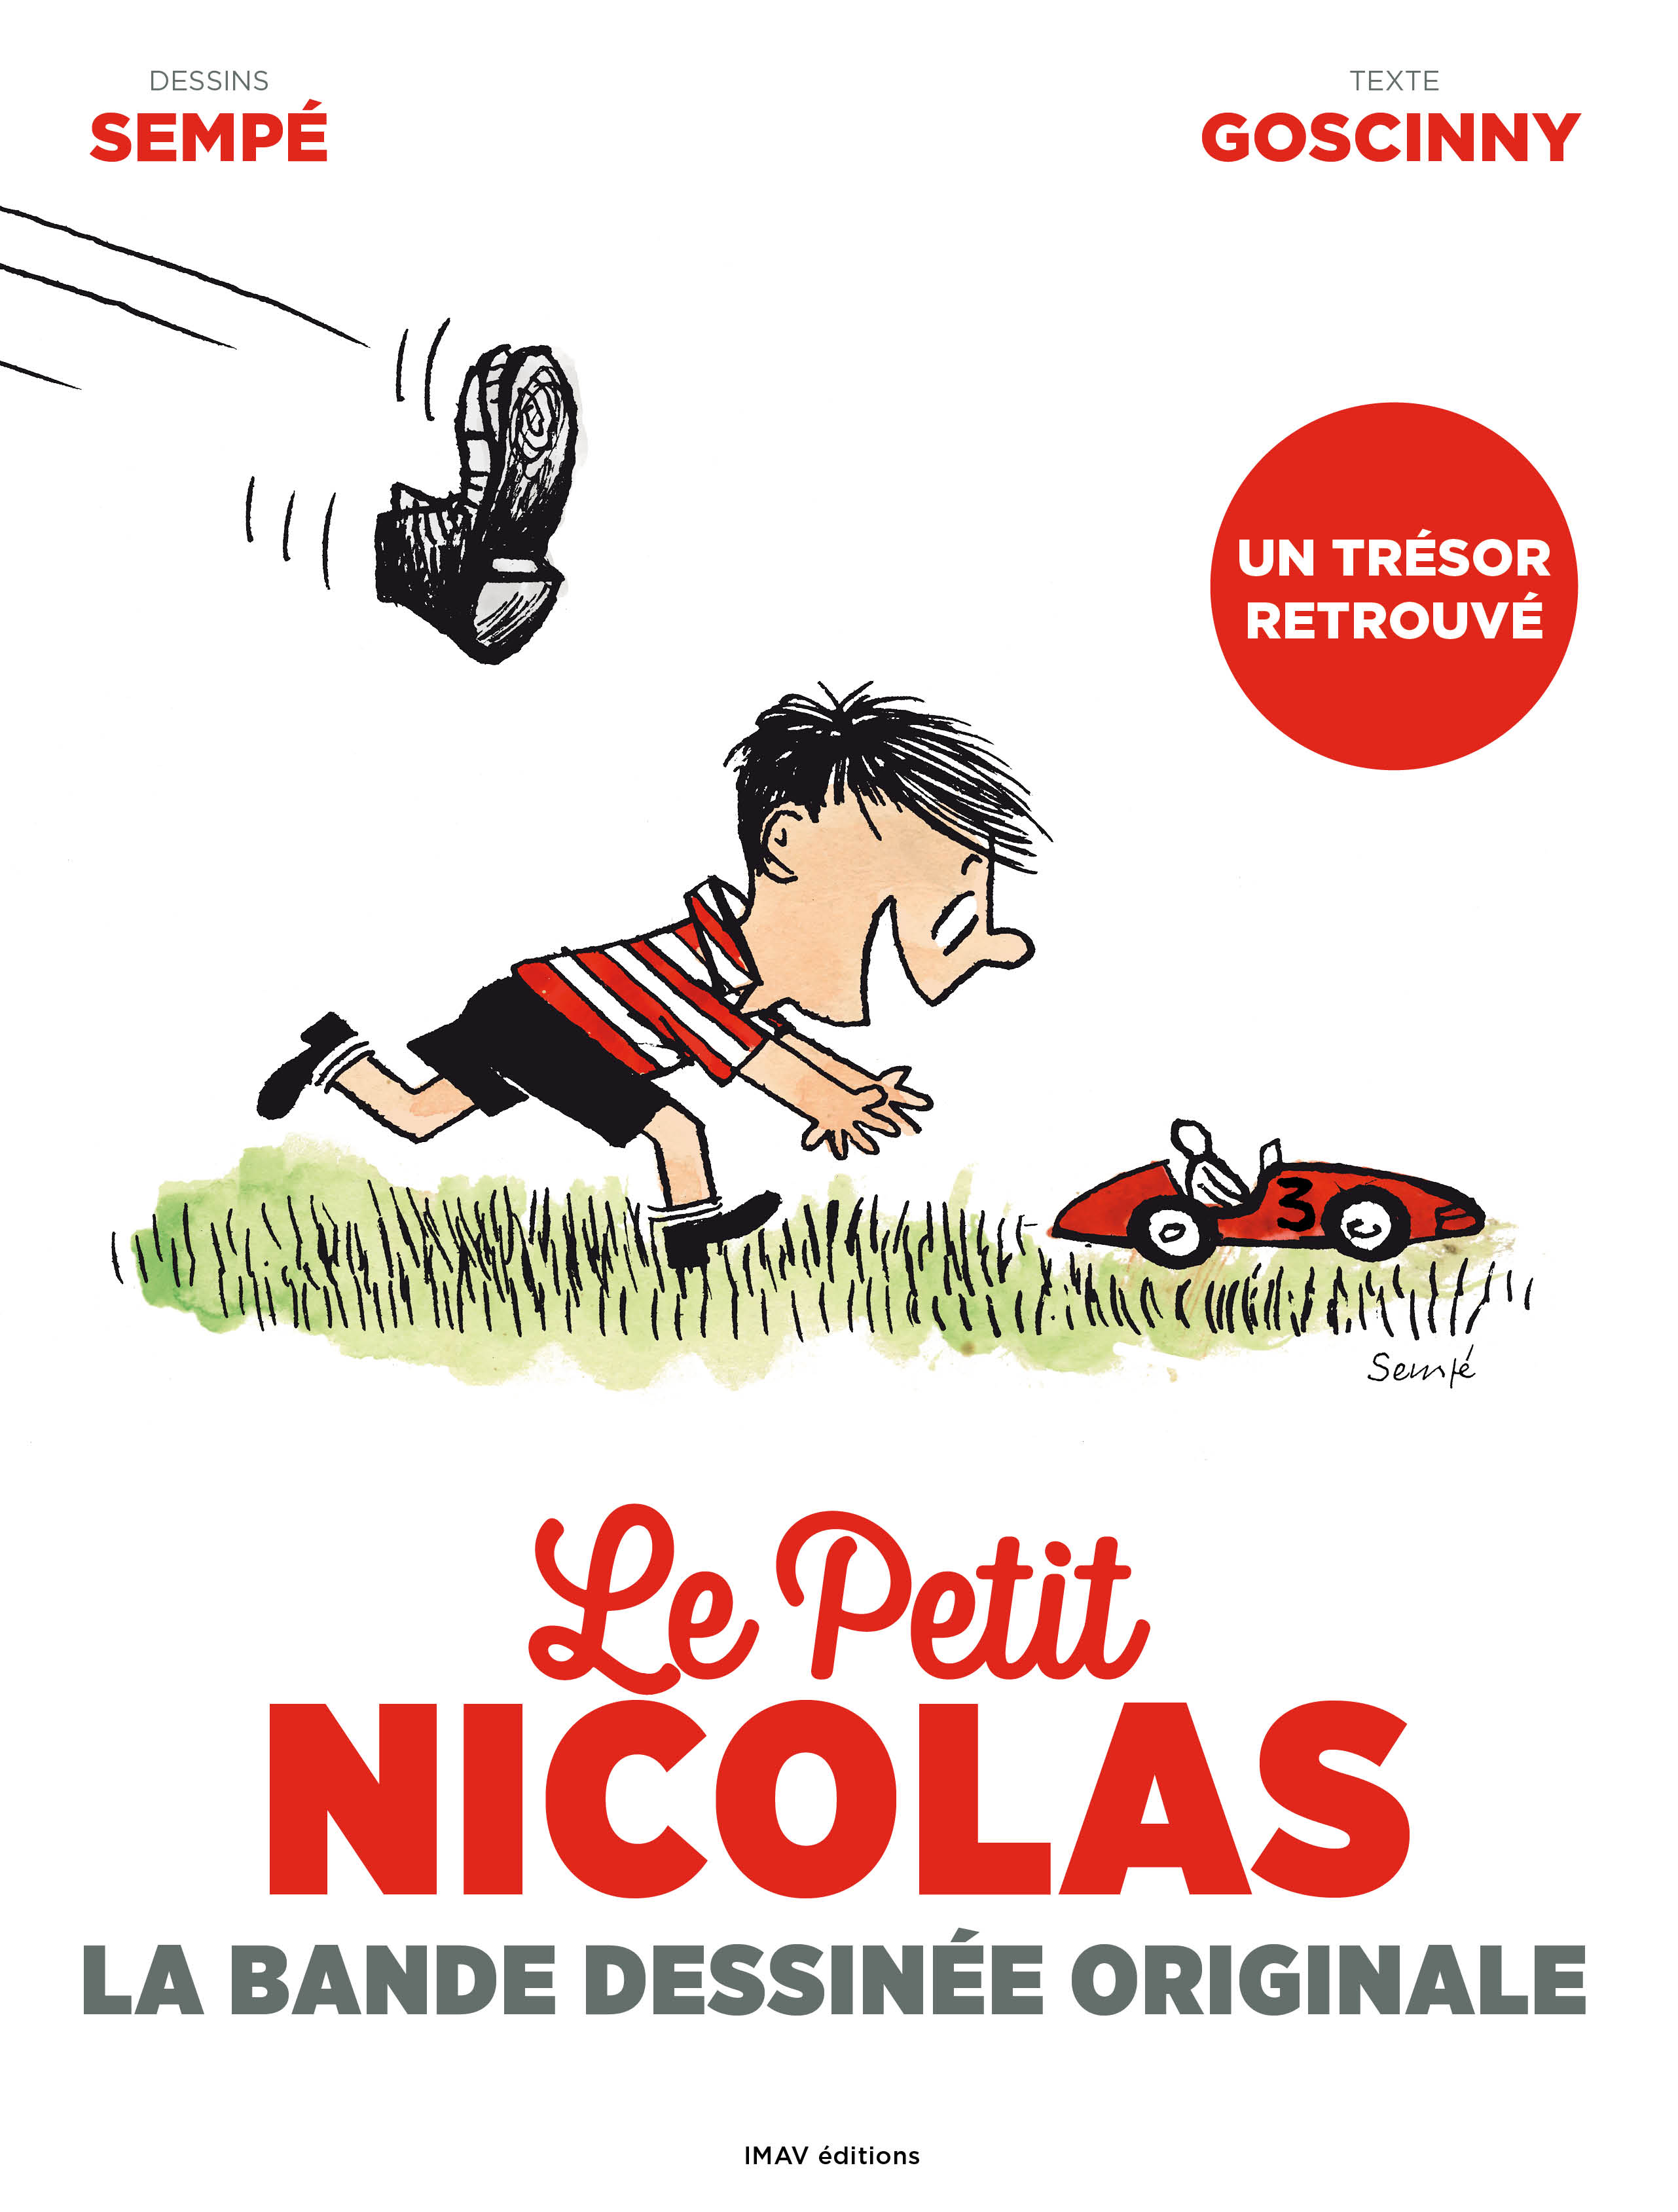 petit-nicolas-la-bande-dessinee-598976cbdd1c5